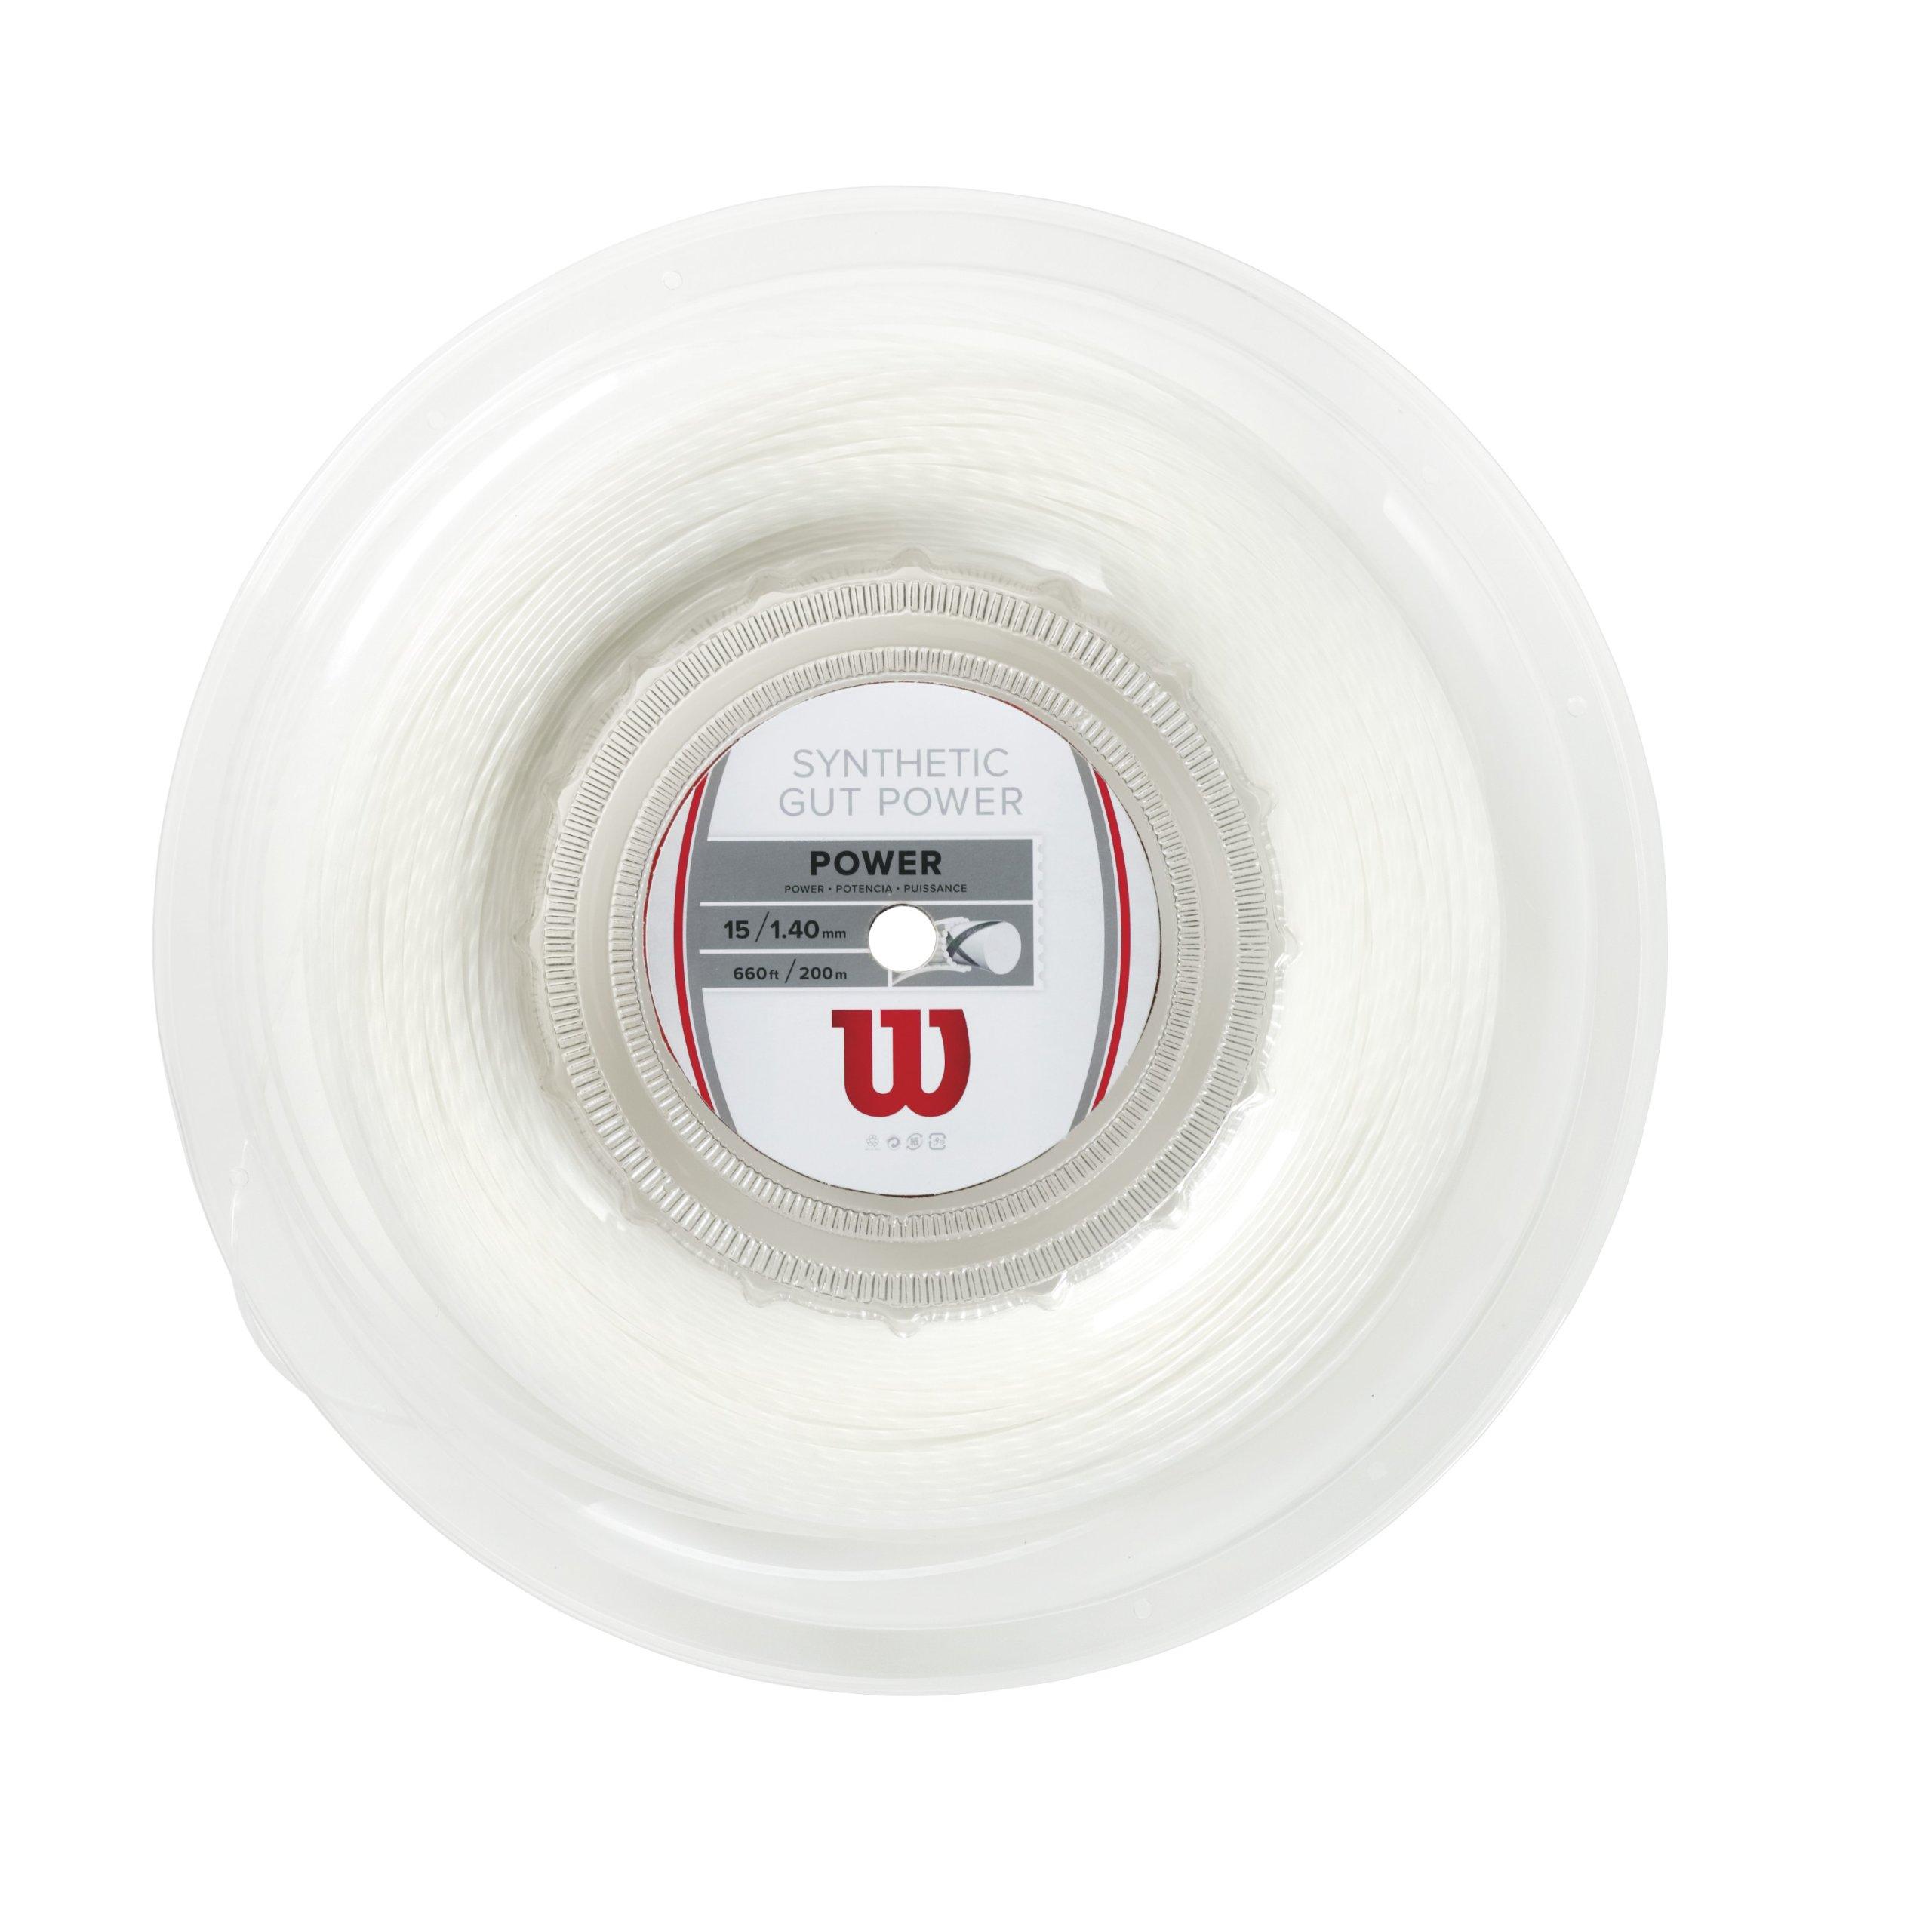 Wilson Synthetic Gut Power 660-Feet Reel, White, 15